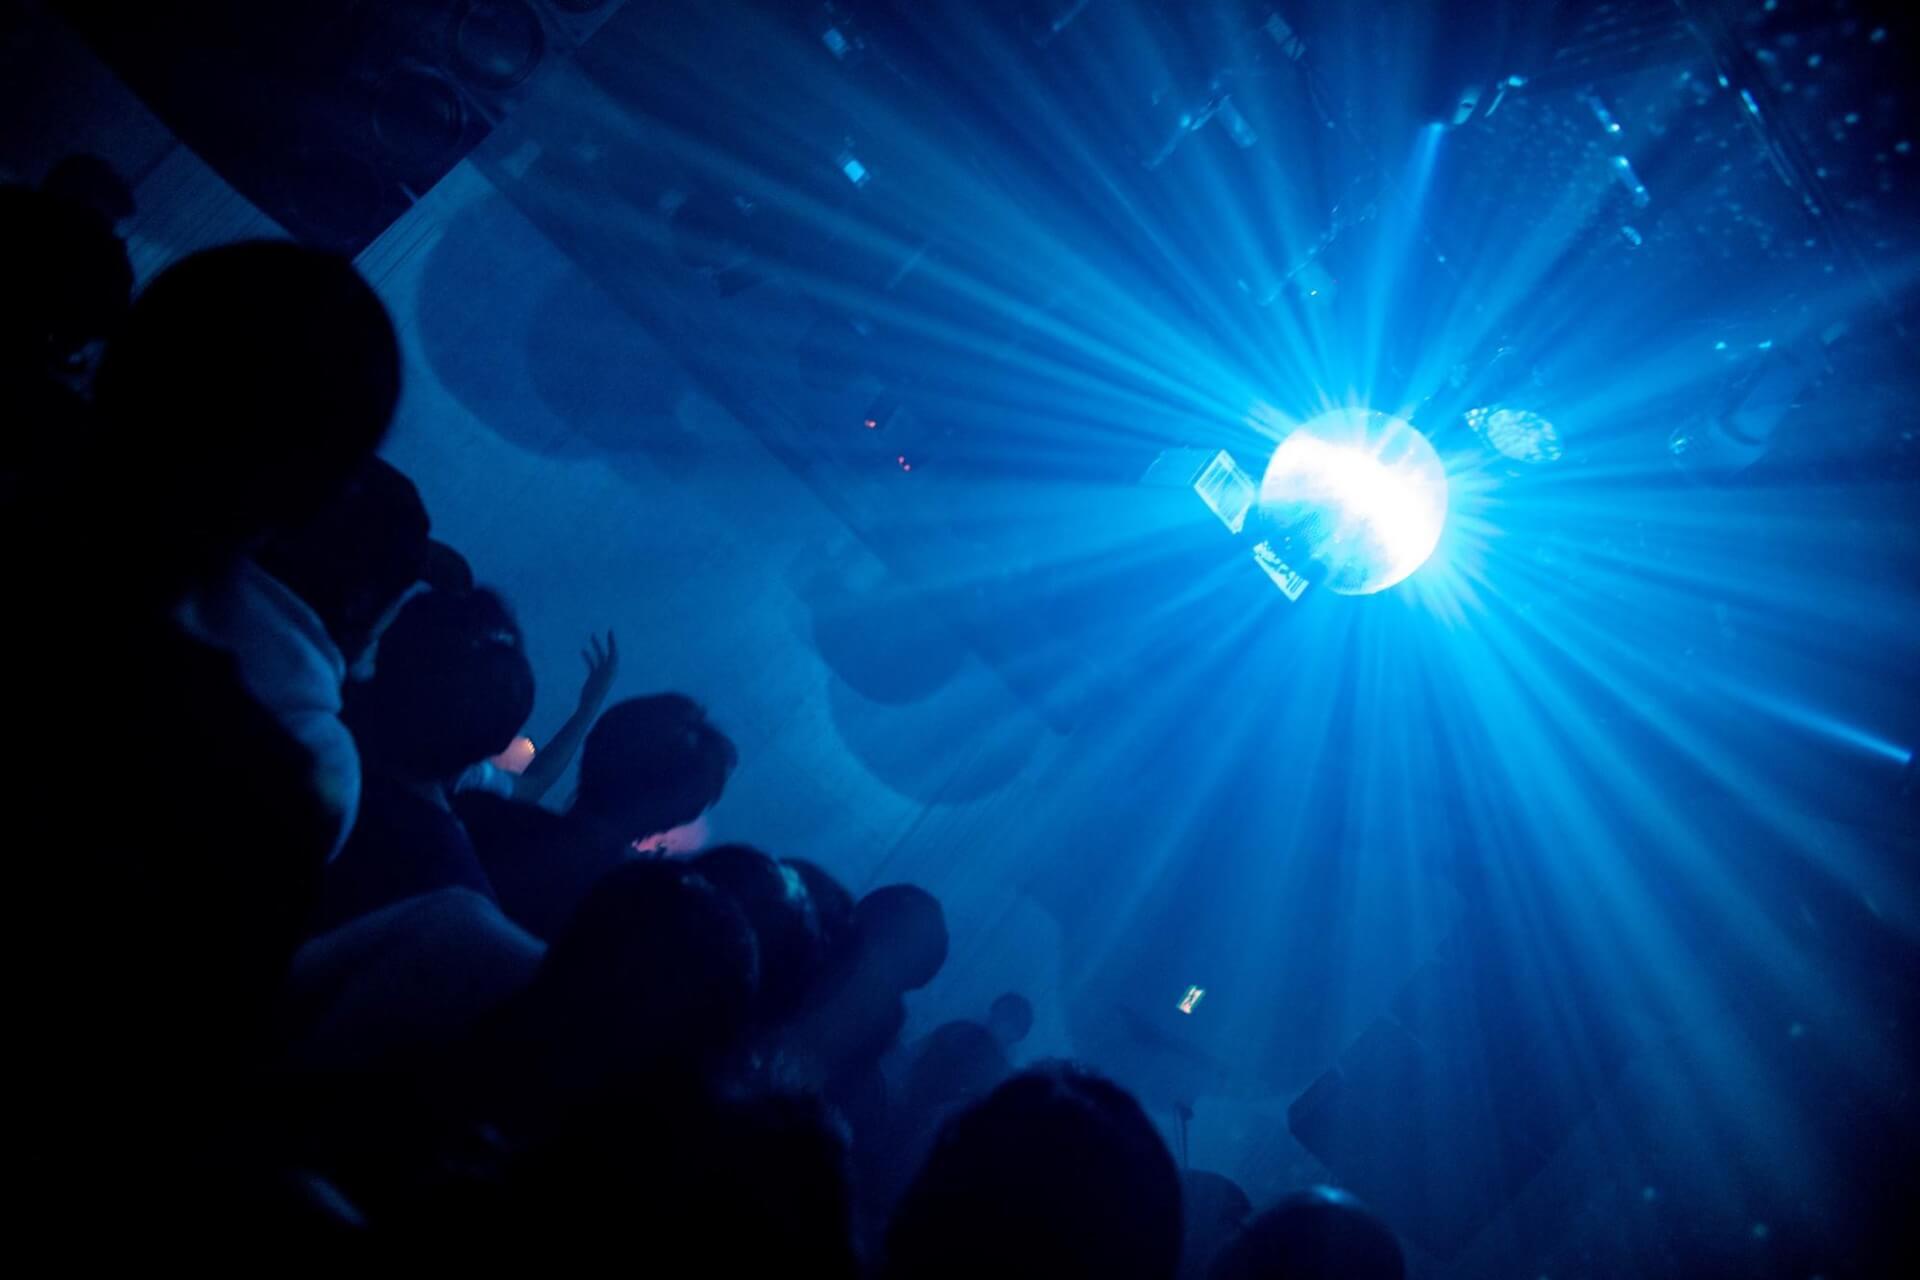 Floating Points at KEWL 2nd Anniversary Party。ダンスミュージックへの初期衝動を想い返した夜 music200116-kewl-floating-points-8